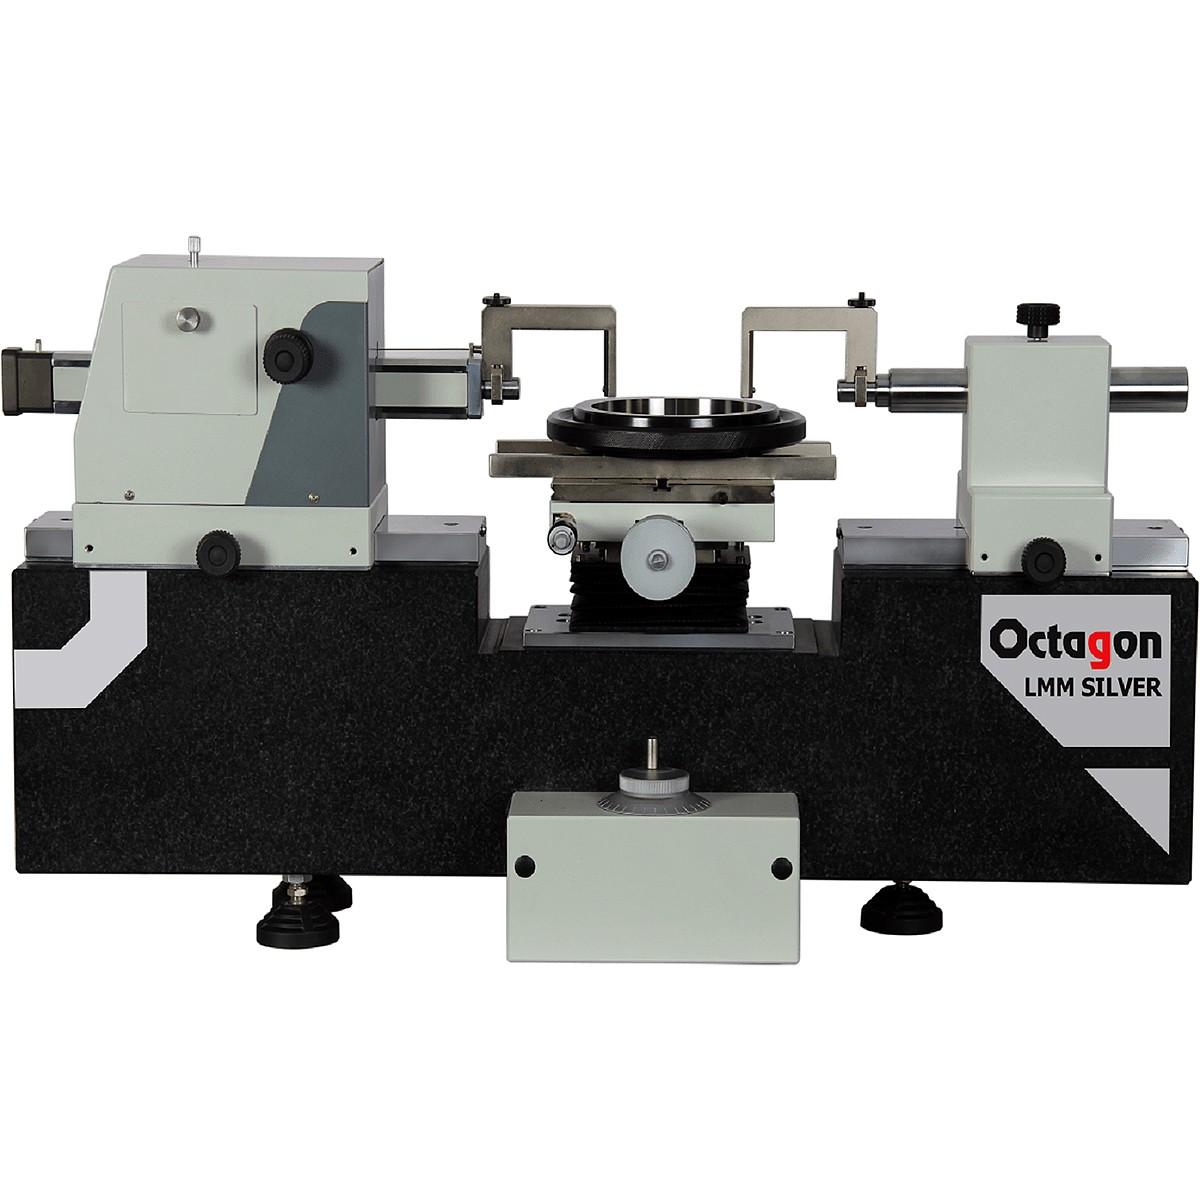 OCTAGON Universal Length Measuring Machine Model LMM Silver